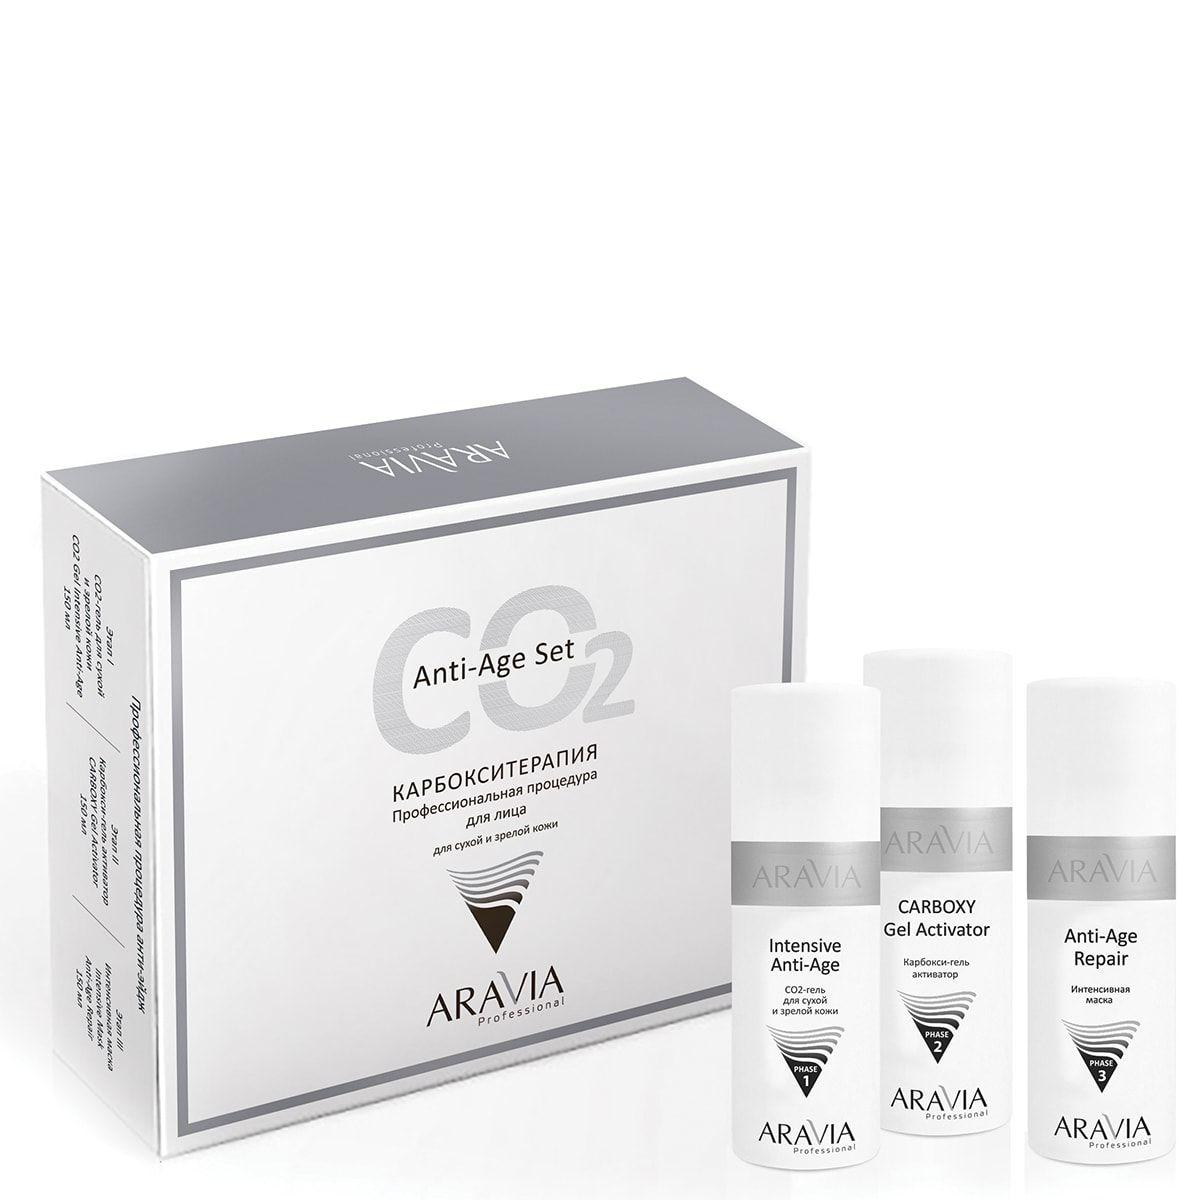 Карбокситерапия Set For Dry And Mature Skin Anti-age Set, Aravia Professional